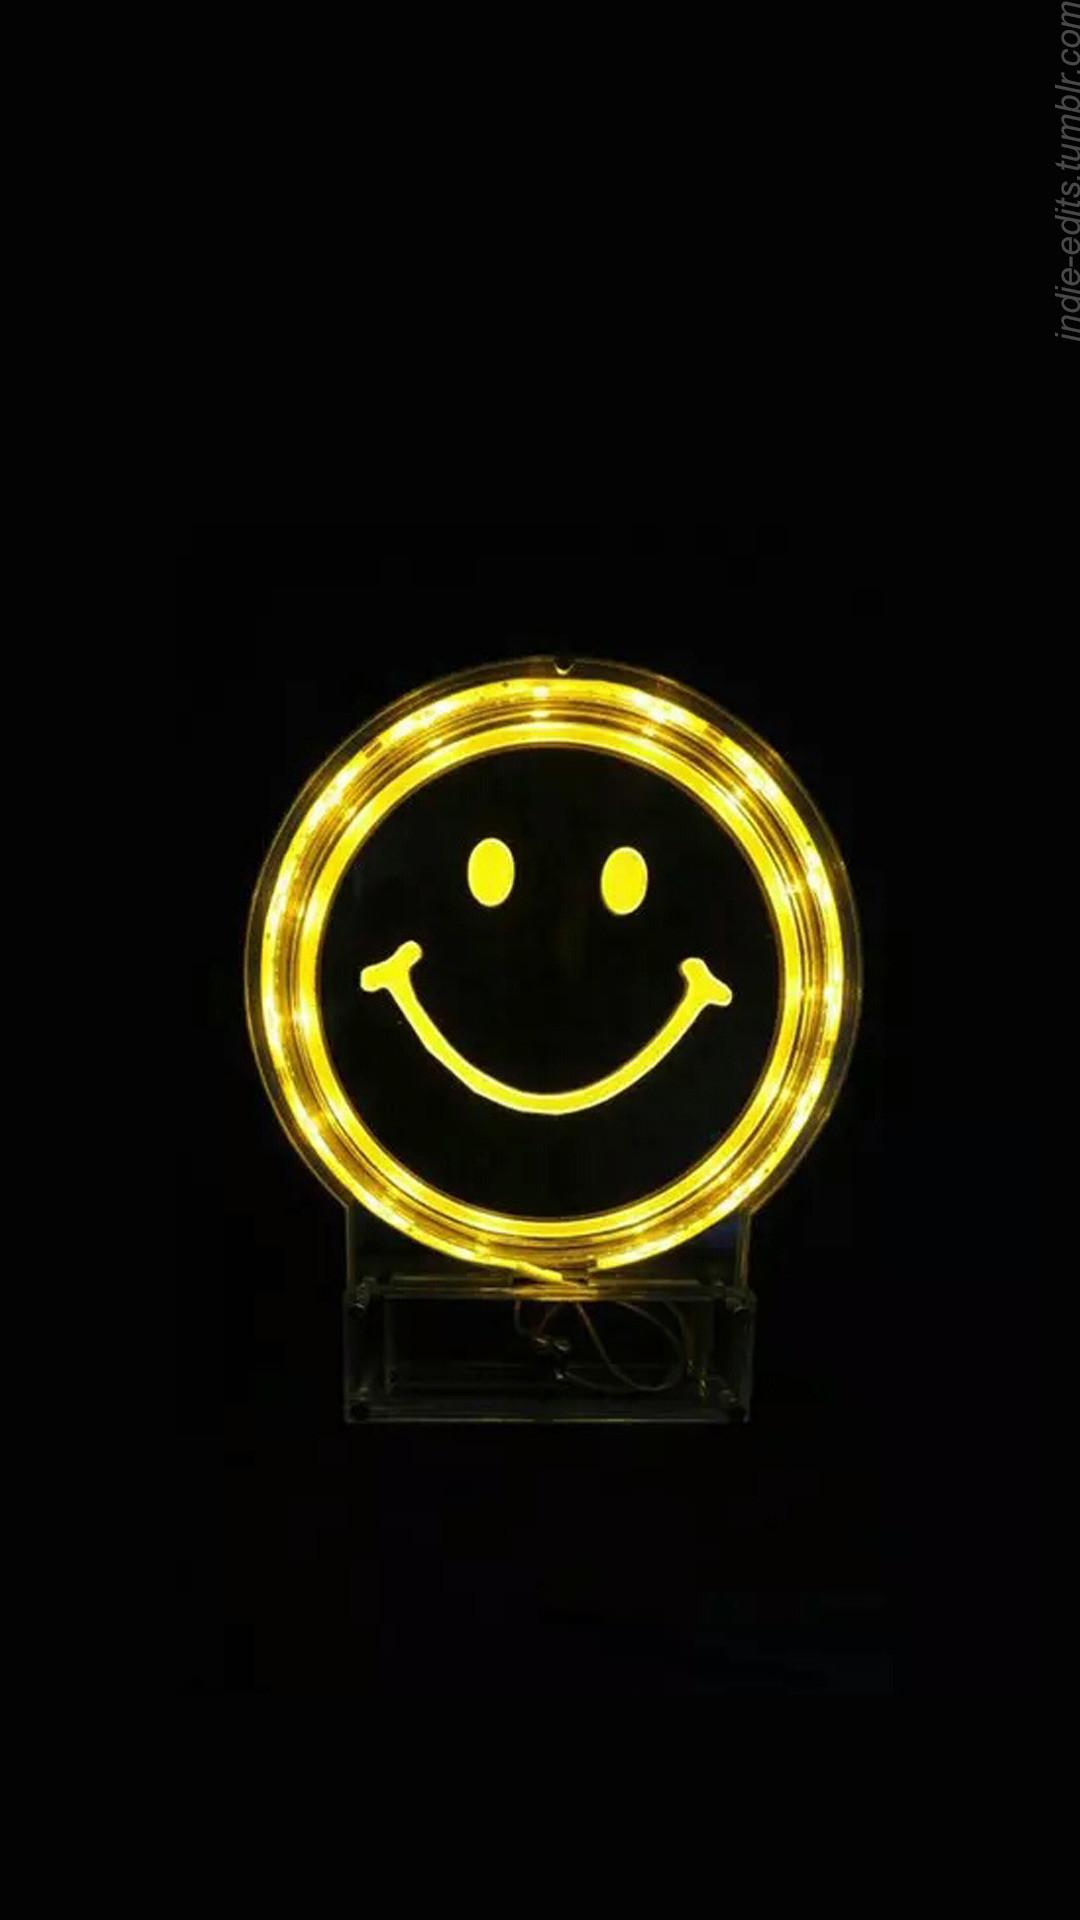 Latar Belakang Neon Kuning (49+ gambar)